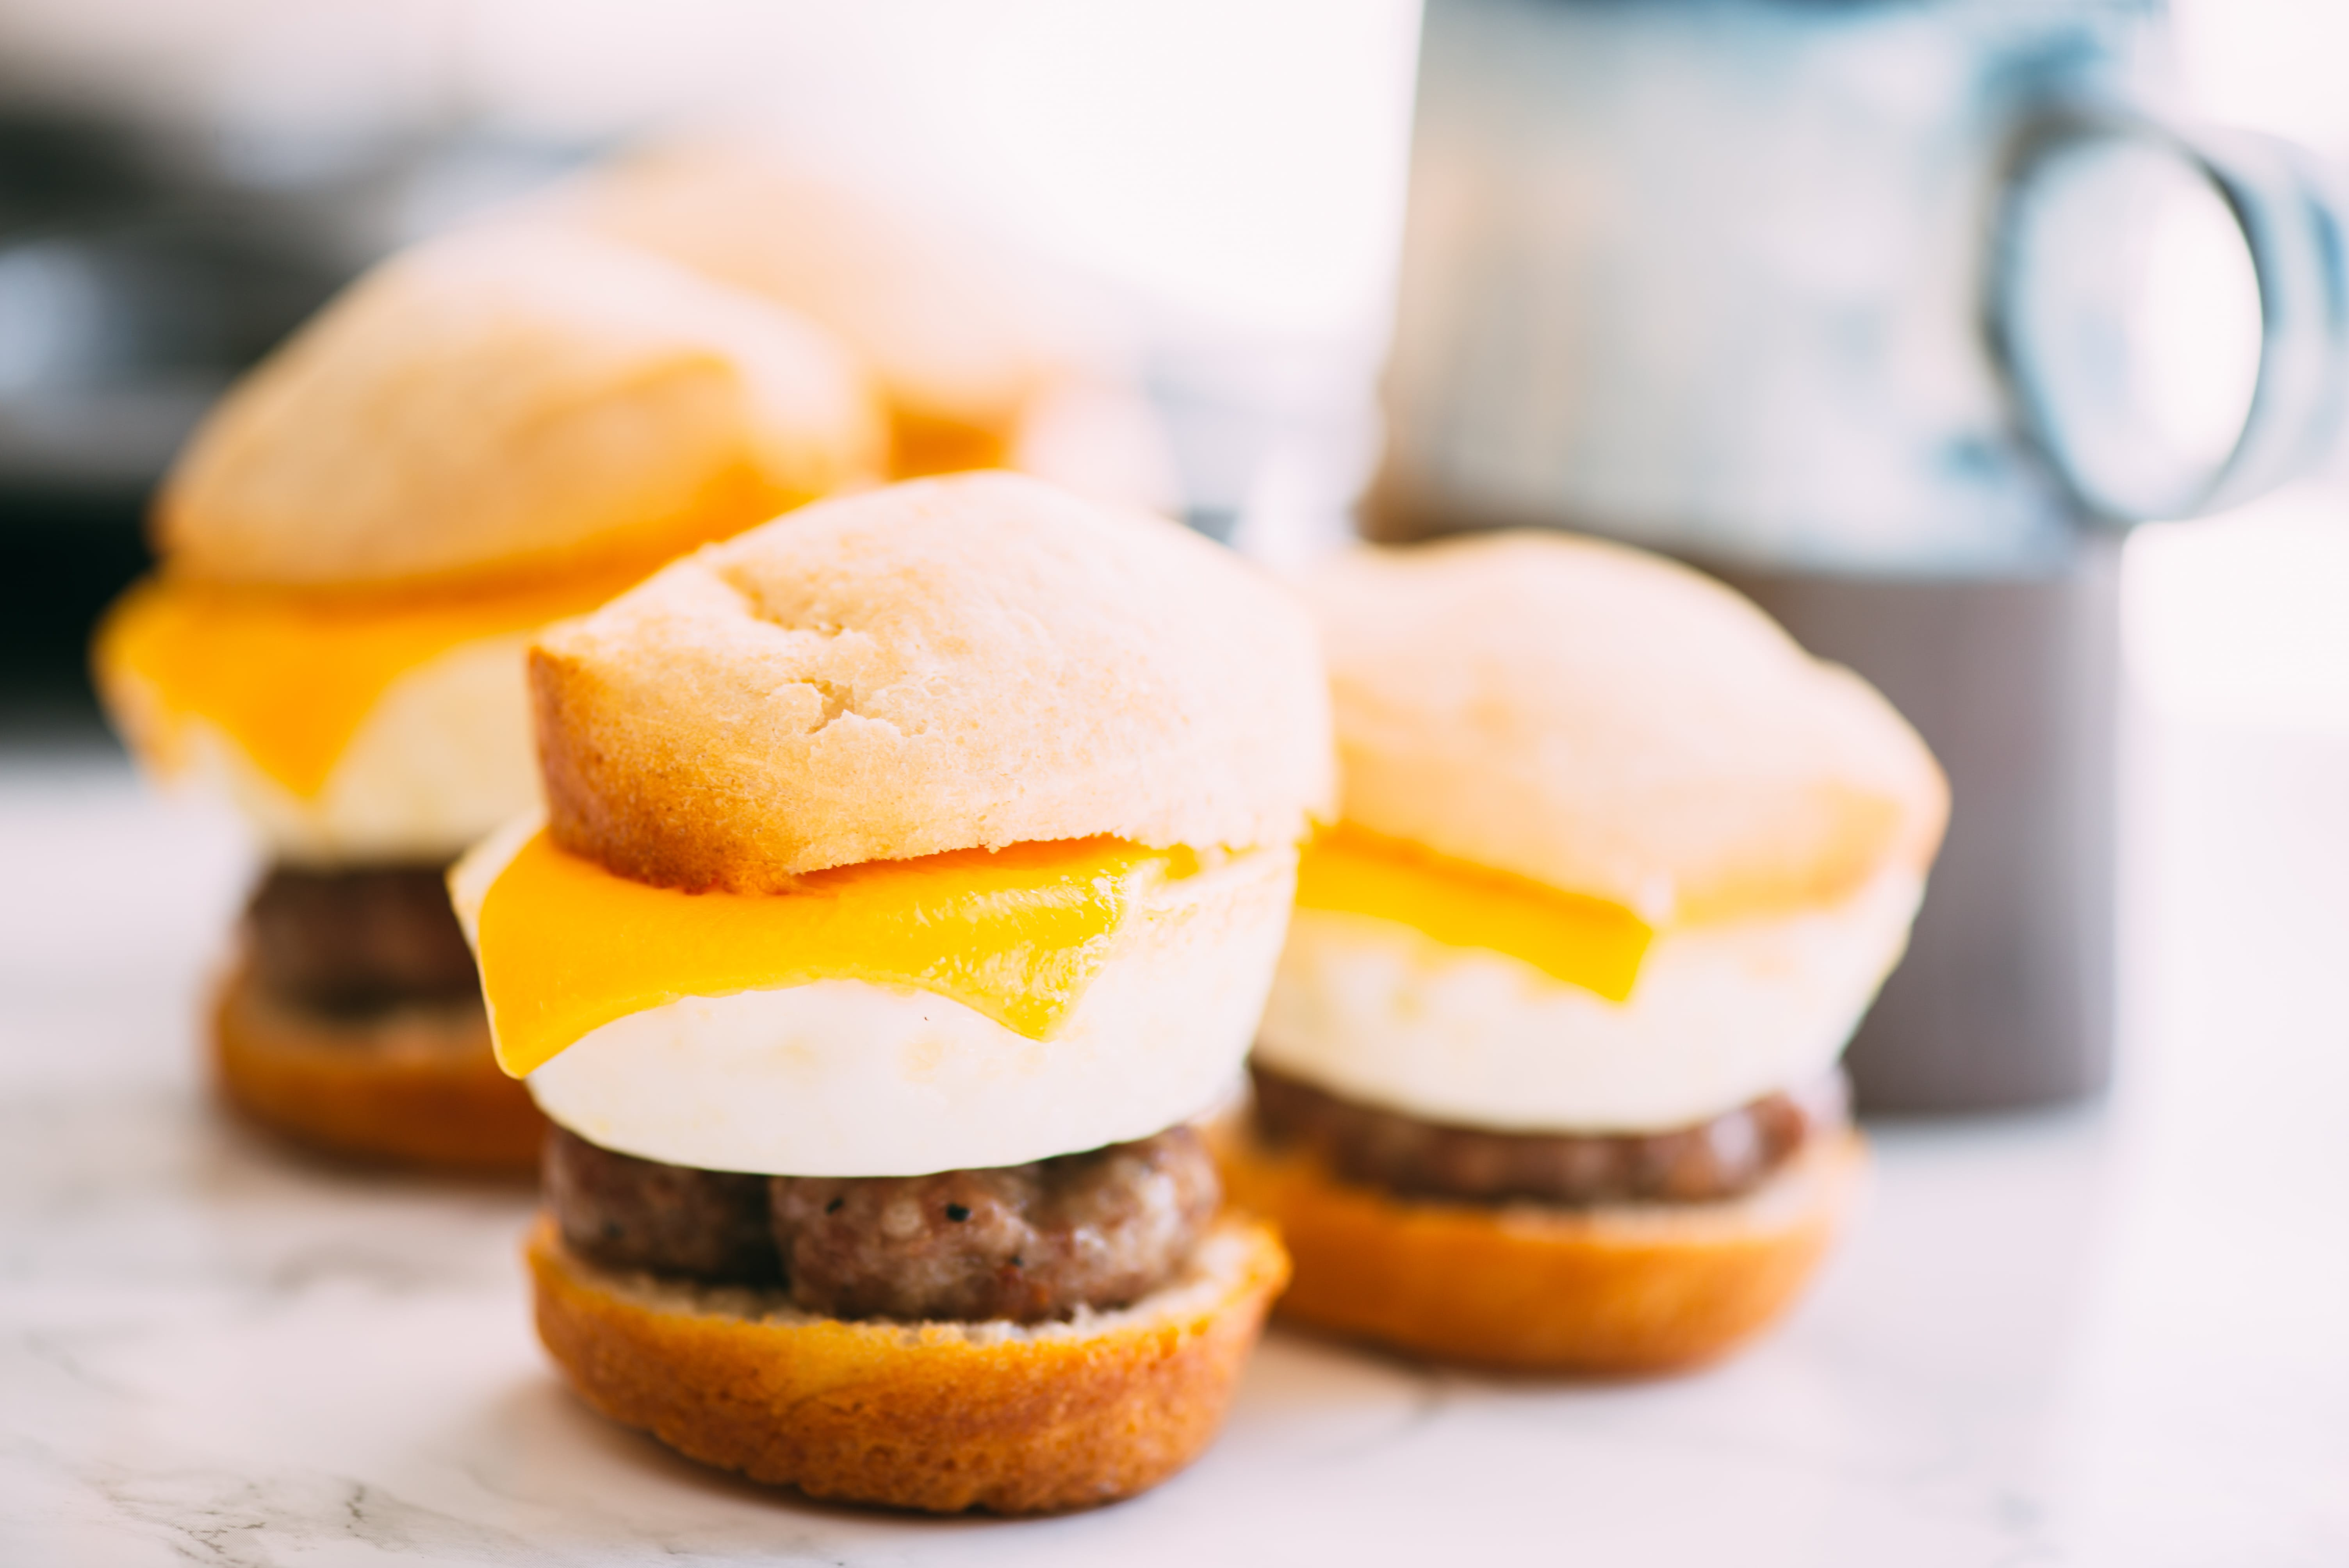 Muffin-Pan Breakfast Sliders